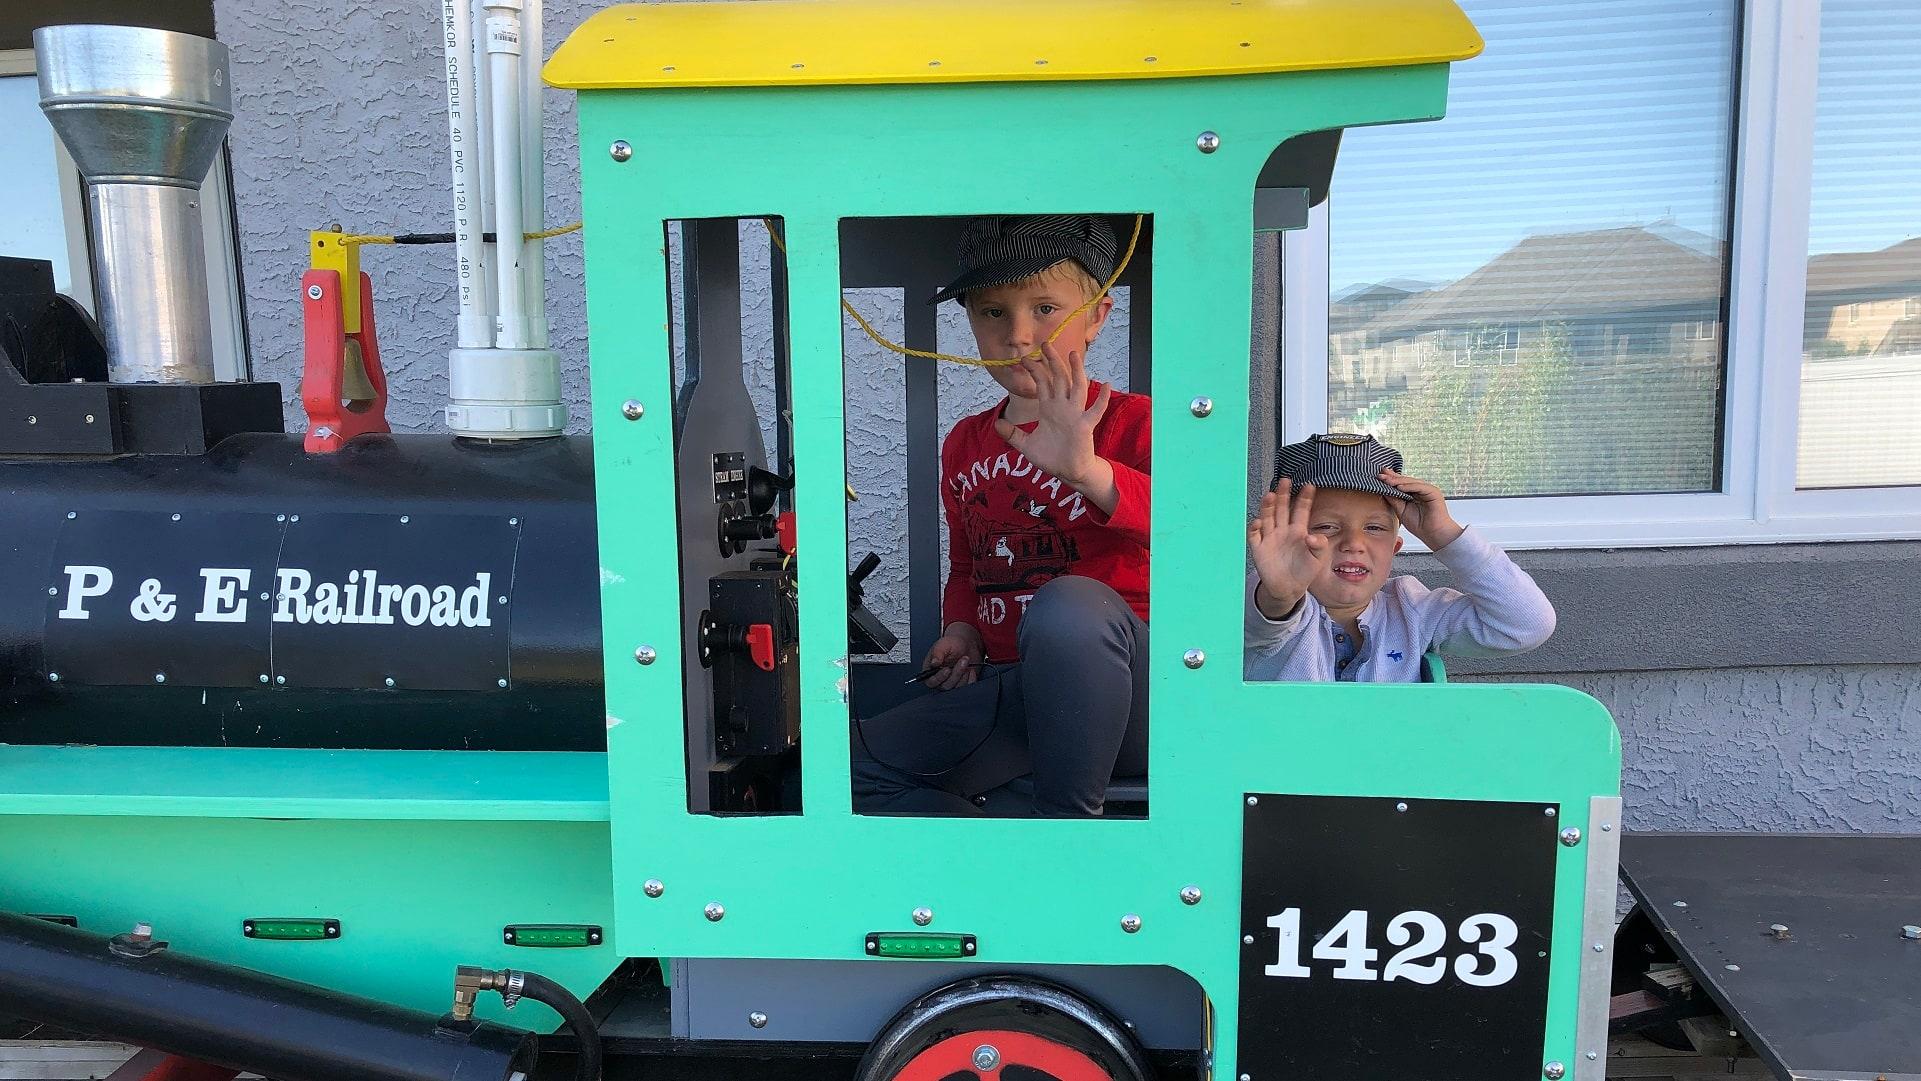 Take a ride on a backyard train | CBC.ca